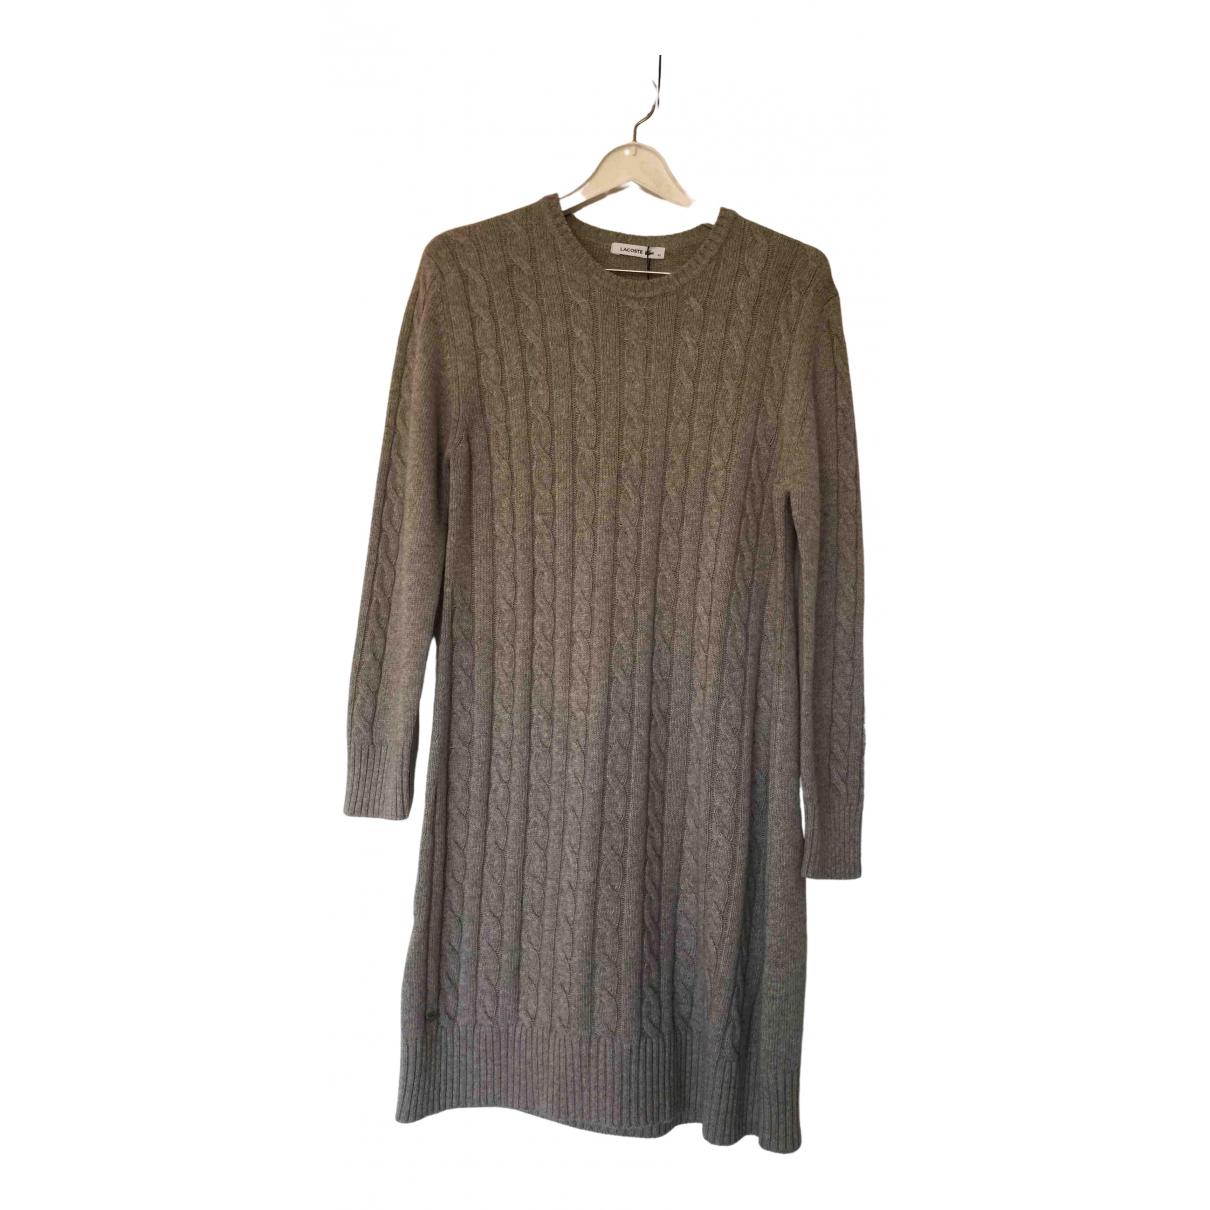 Lacoste \N Kleid in  Beige Kaschmir